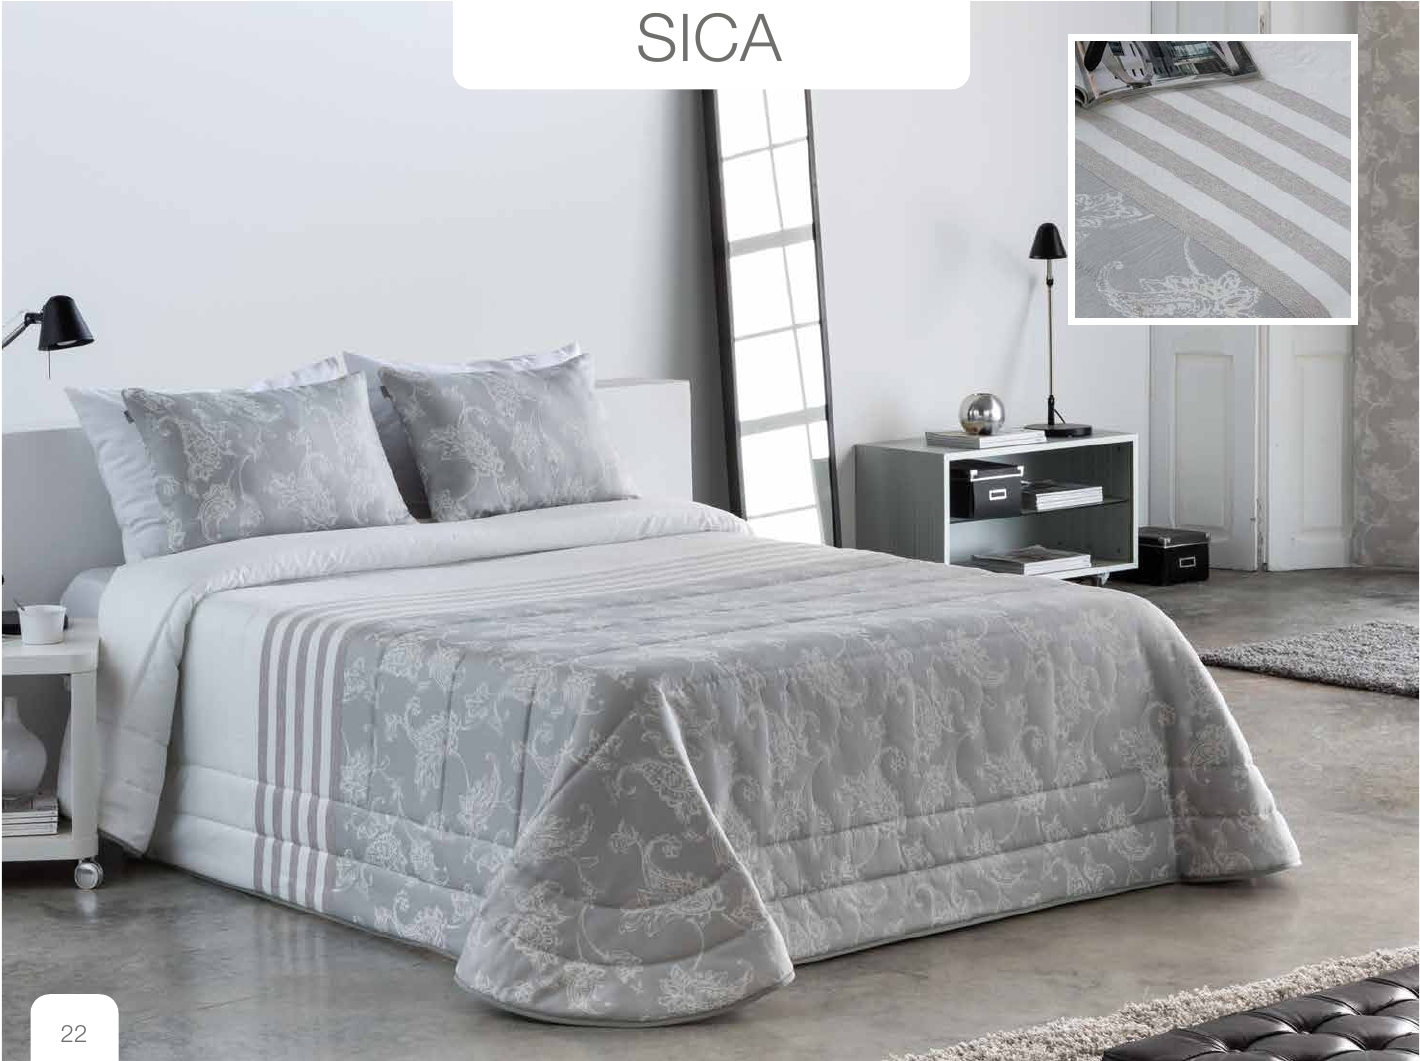 Conforter Bouti Jacquard Sica Gris